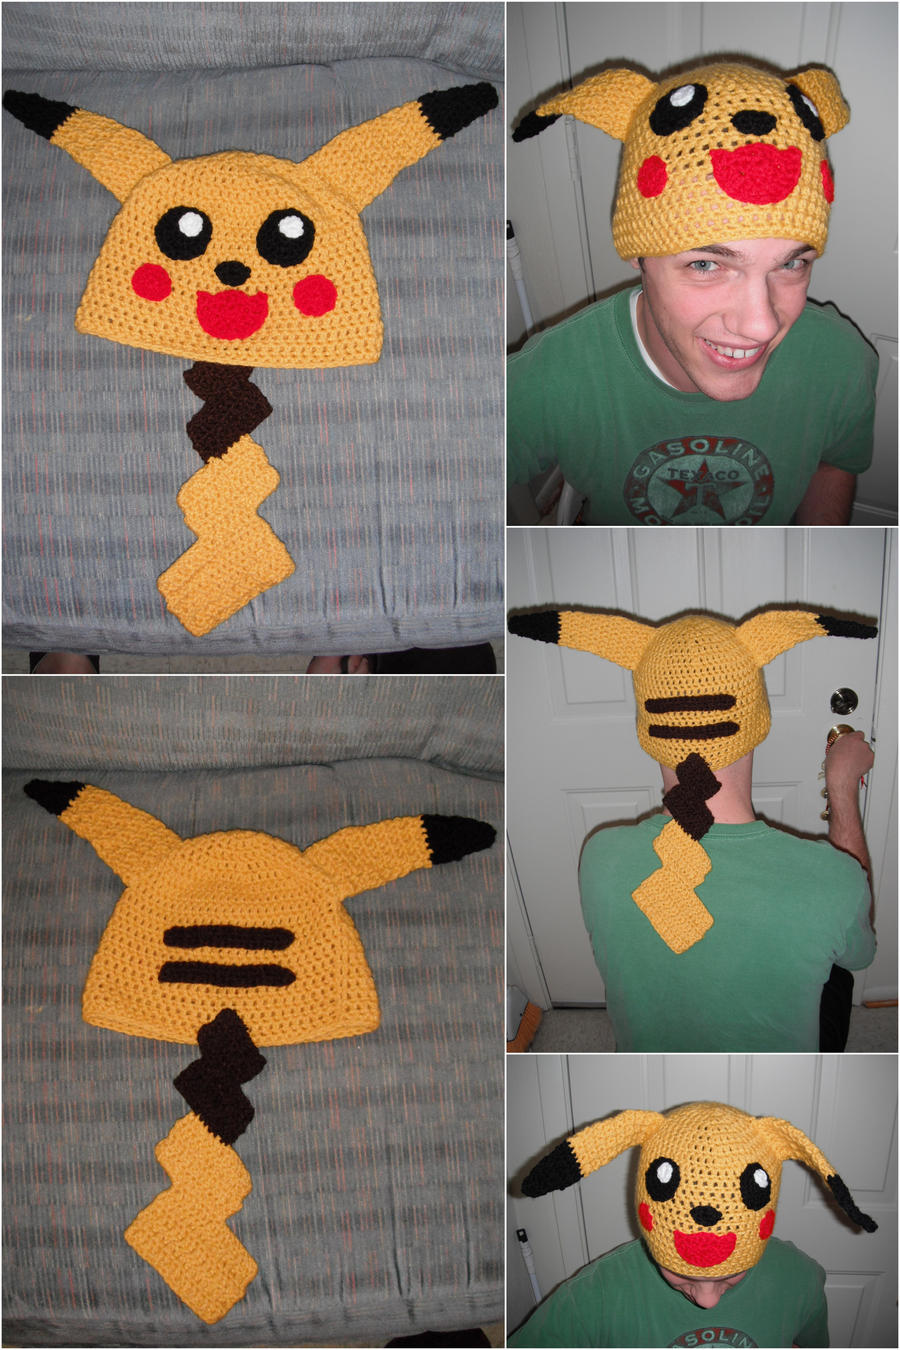 Crochet Pikachu Hat by Mormongoaliegurl on DeviantArt